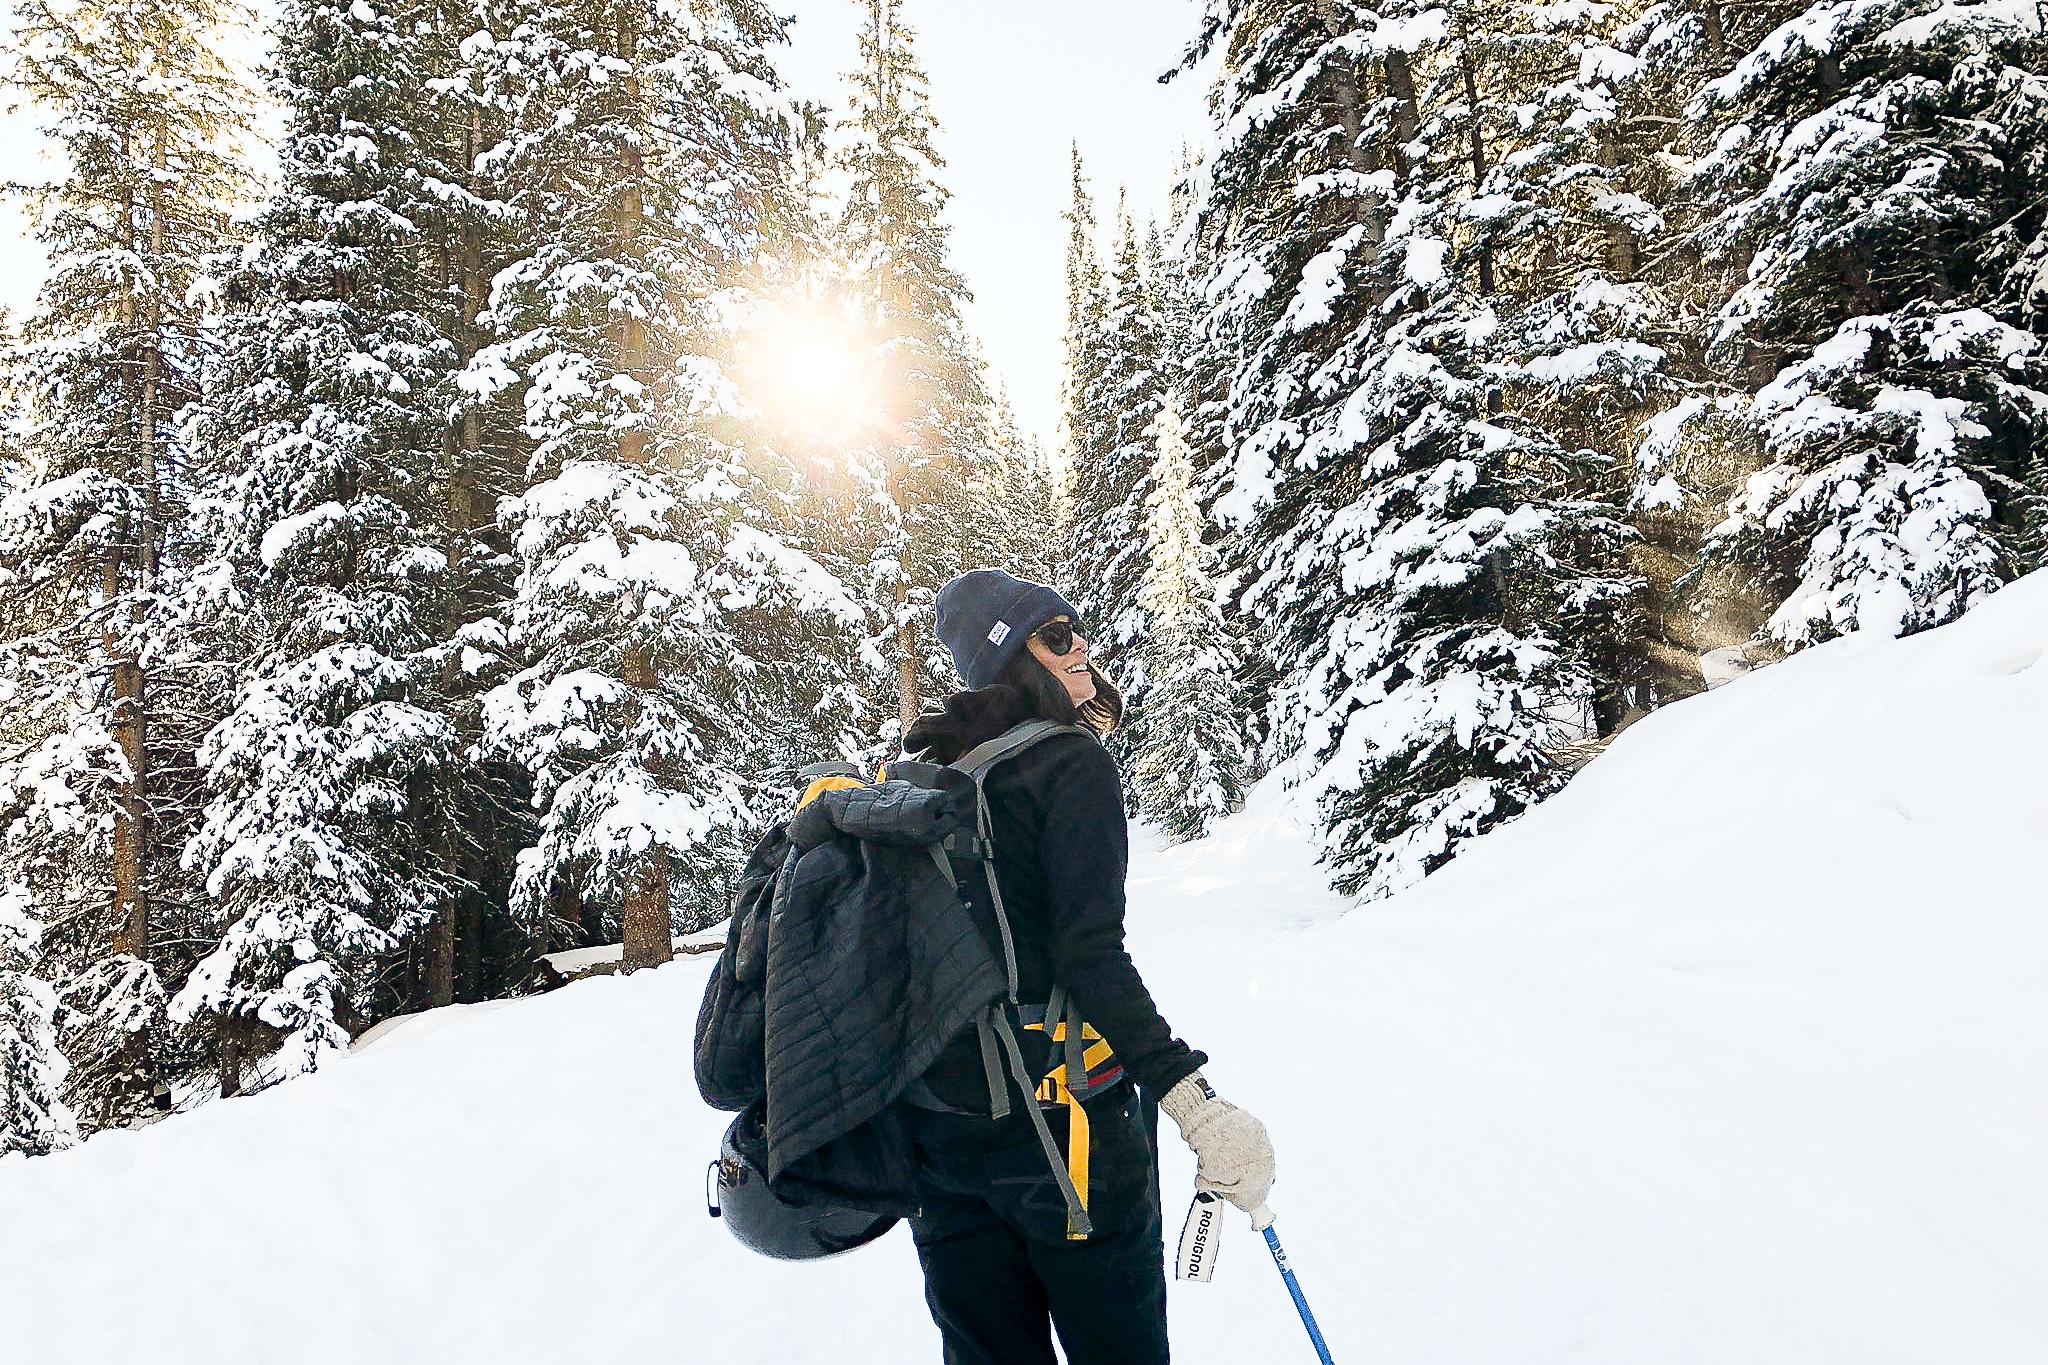 Mt Washington Alpine Resort - Identifying the right strategic directionfor their winter season